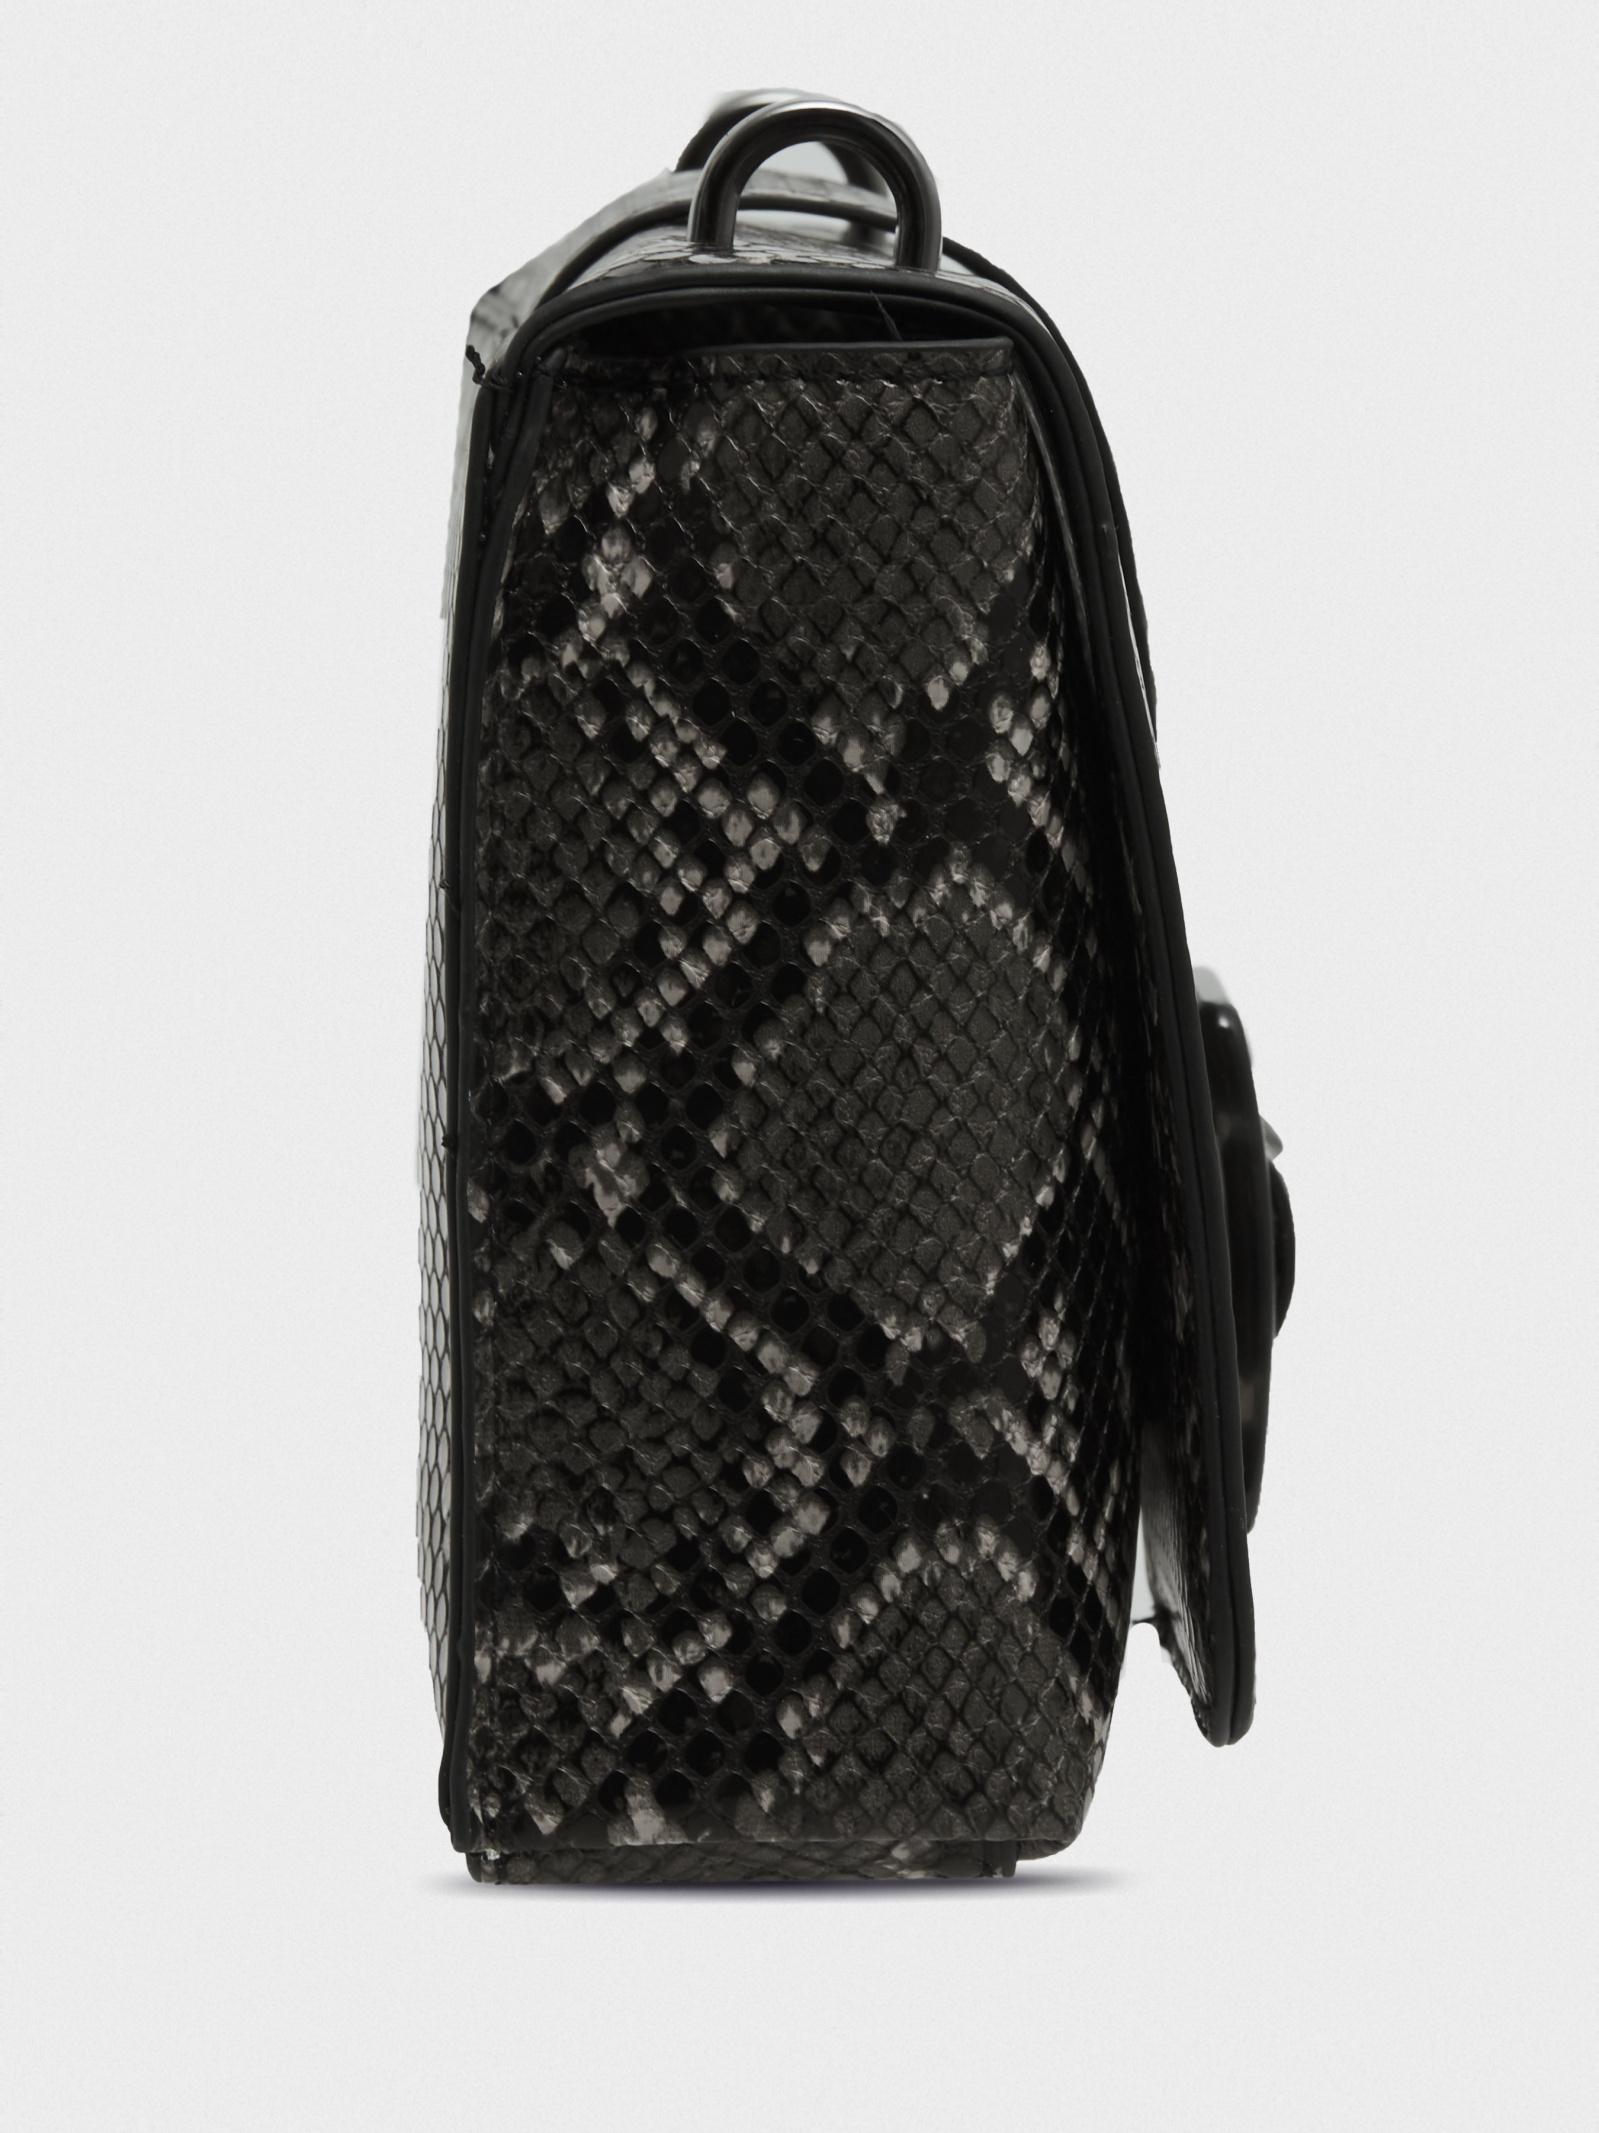 Сумка  Marco Tozzi модель 61017-24-021 black/snake качество, 2017